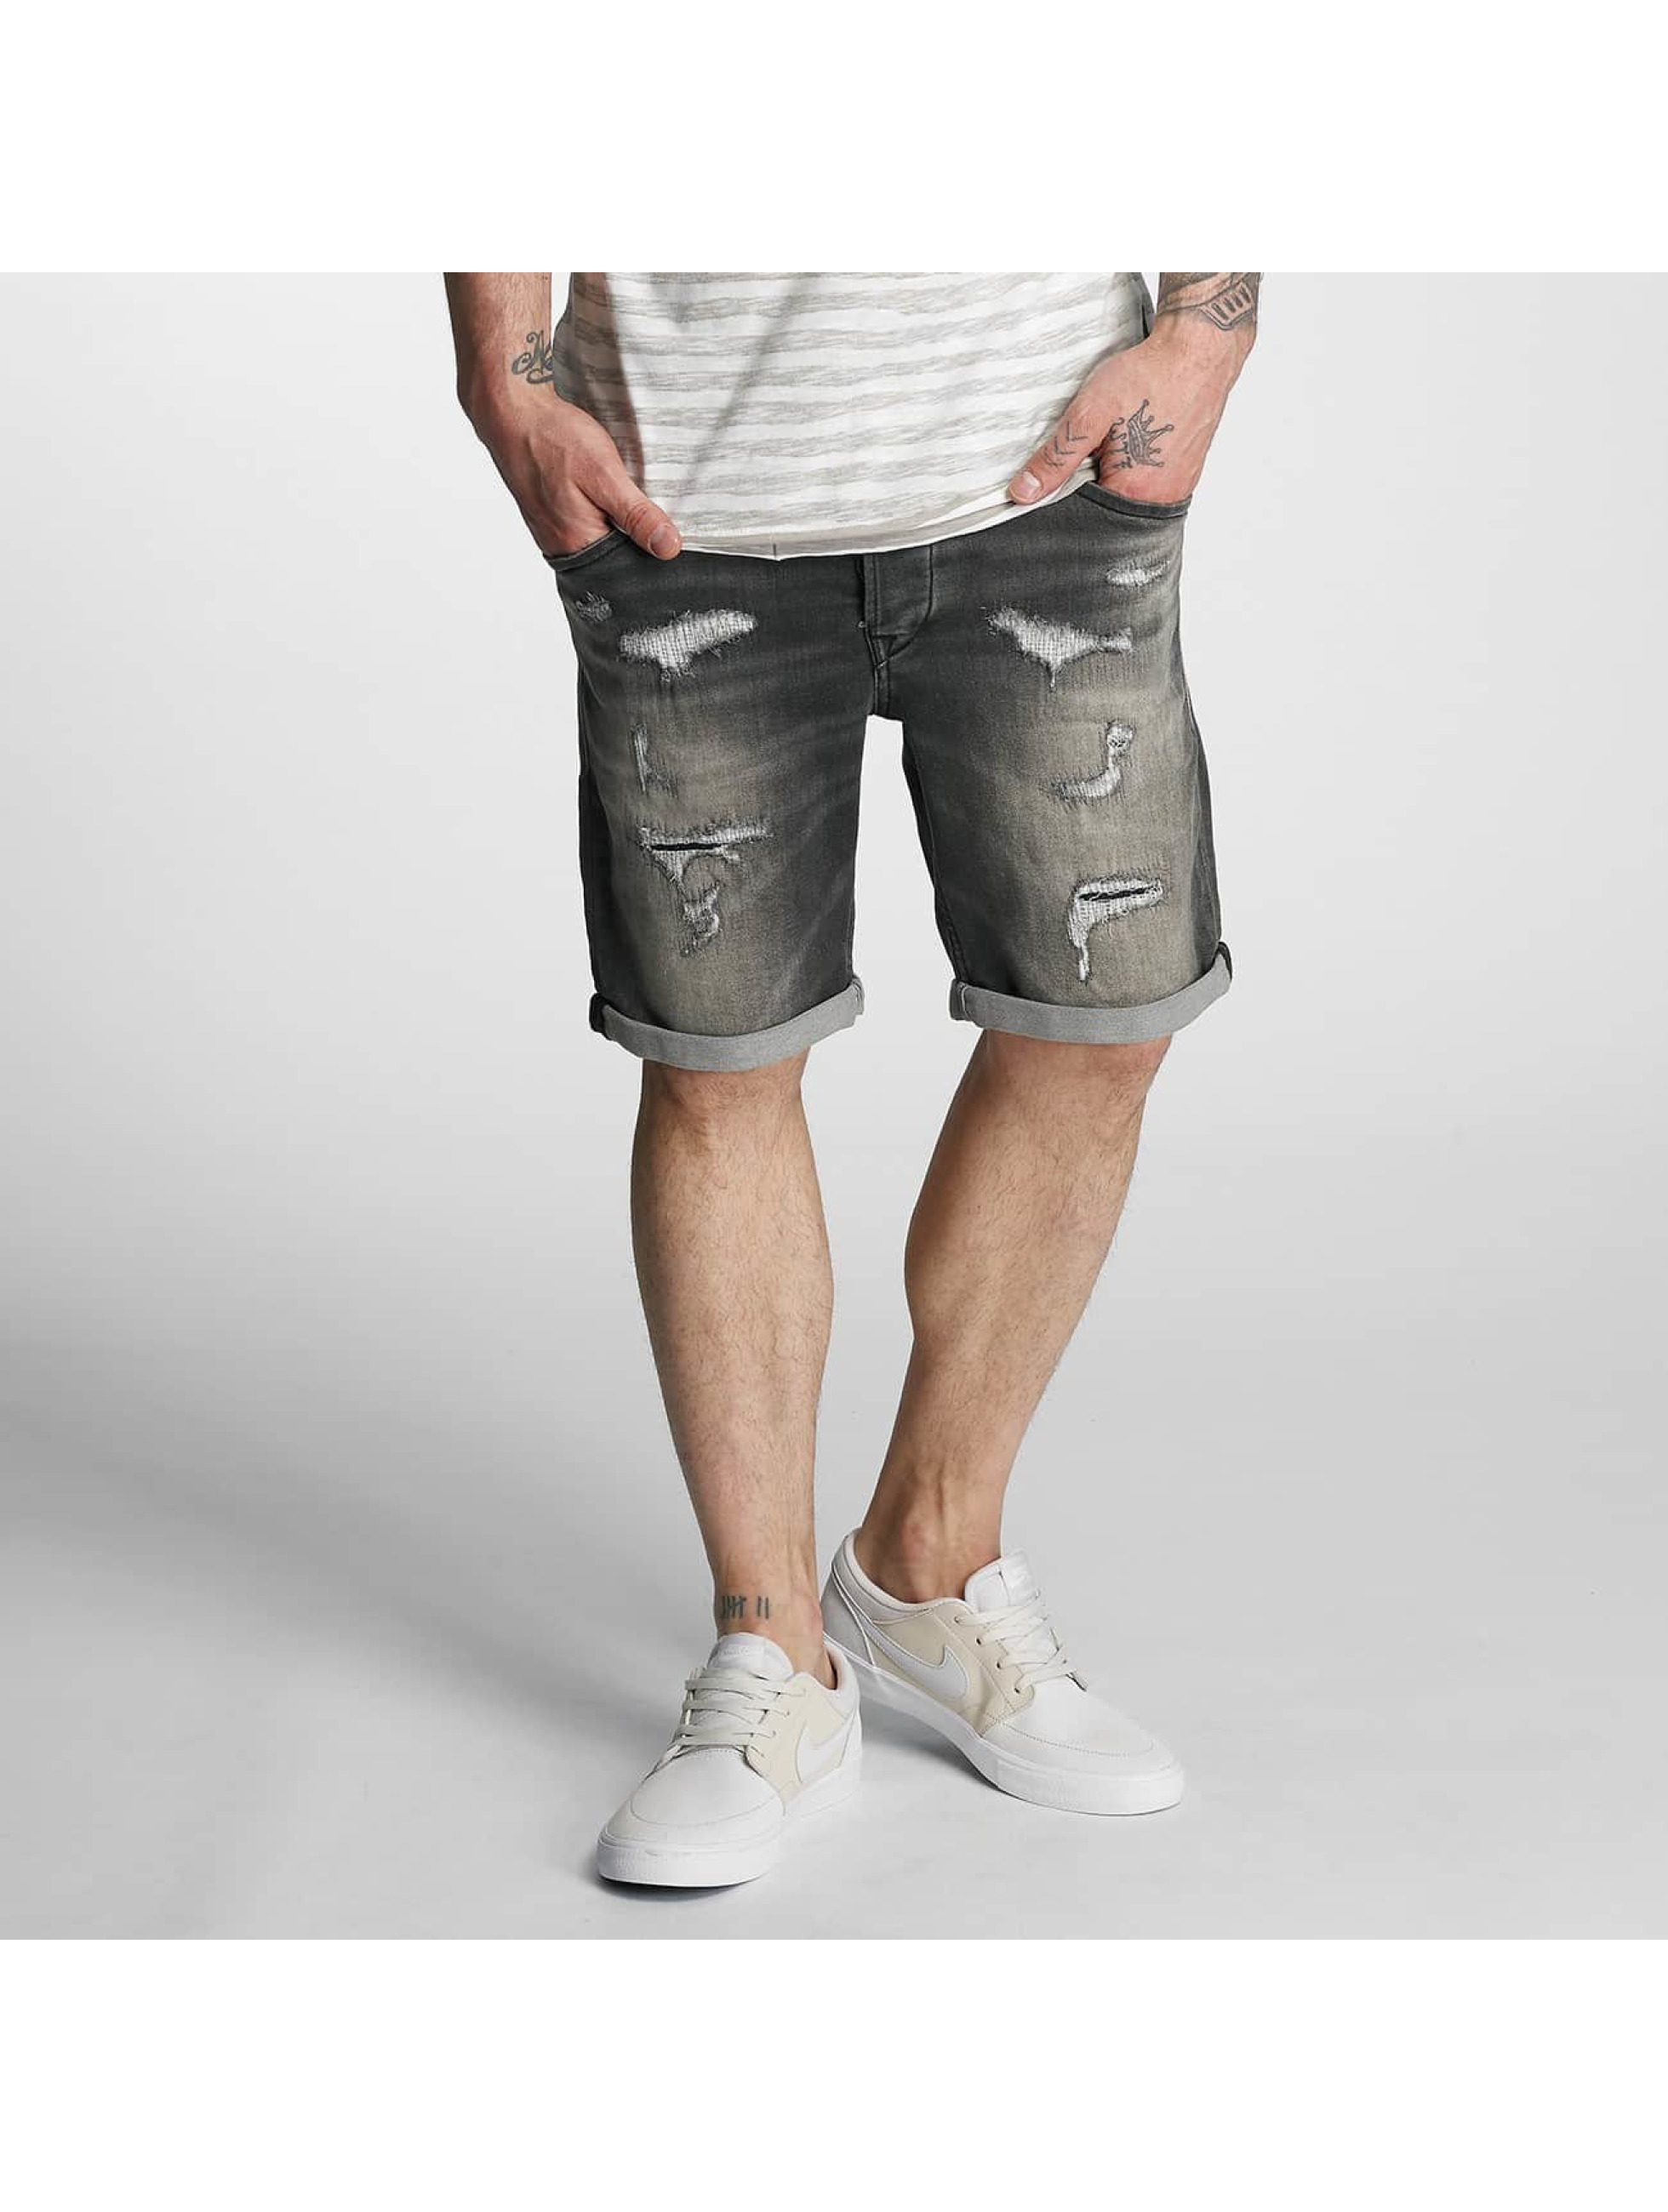 Jack & Jones Pantalon / Shorts jjiRick jjDash en gris